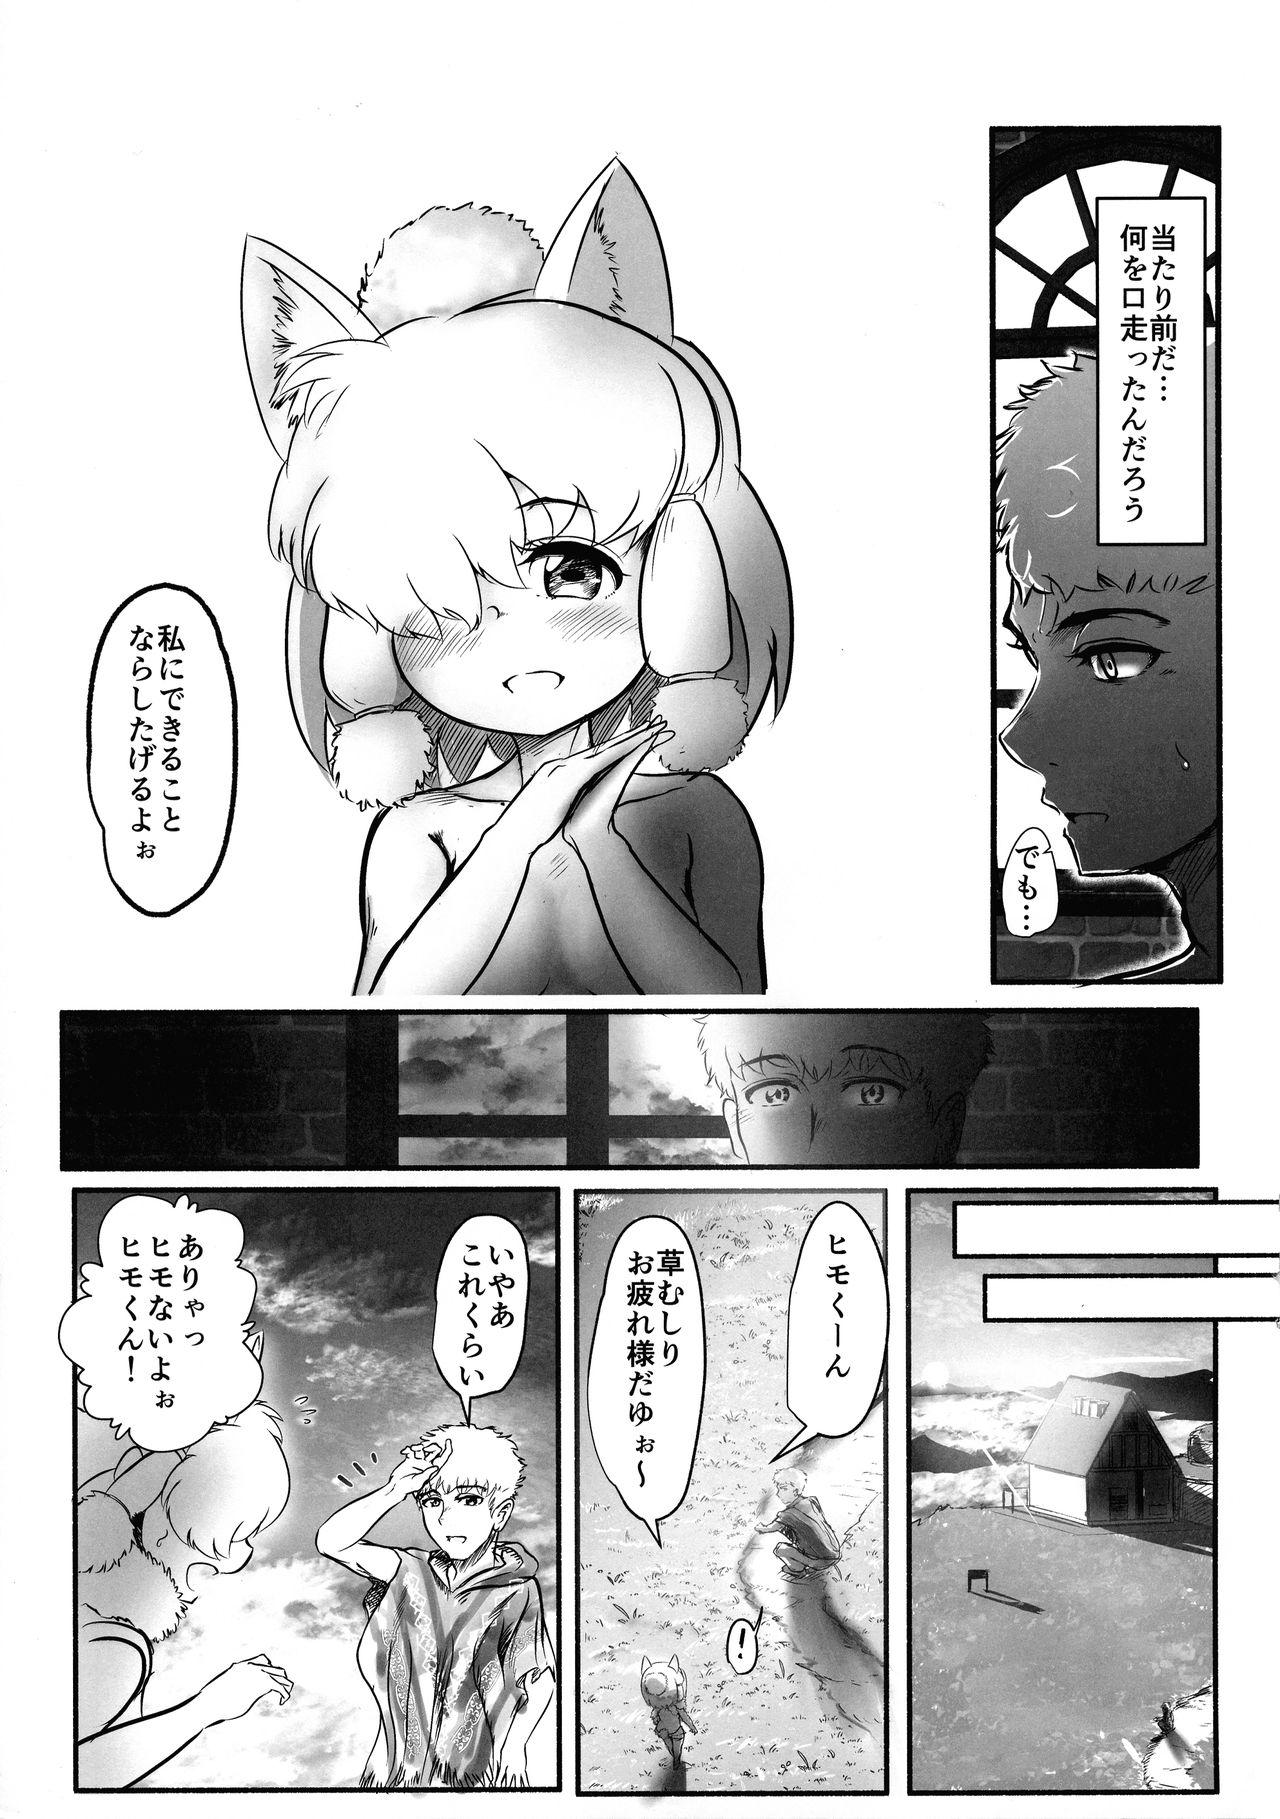 Fuwaaa! Irasshaai! Ura Iyashi no Alpaca-san Goudou 98